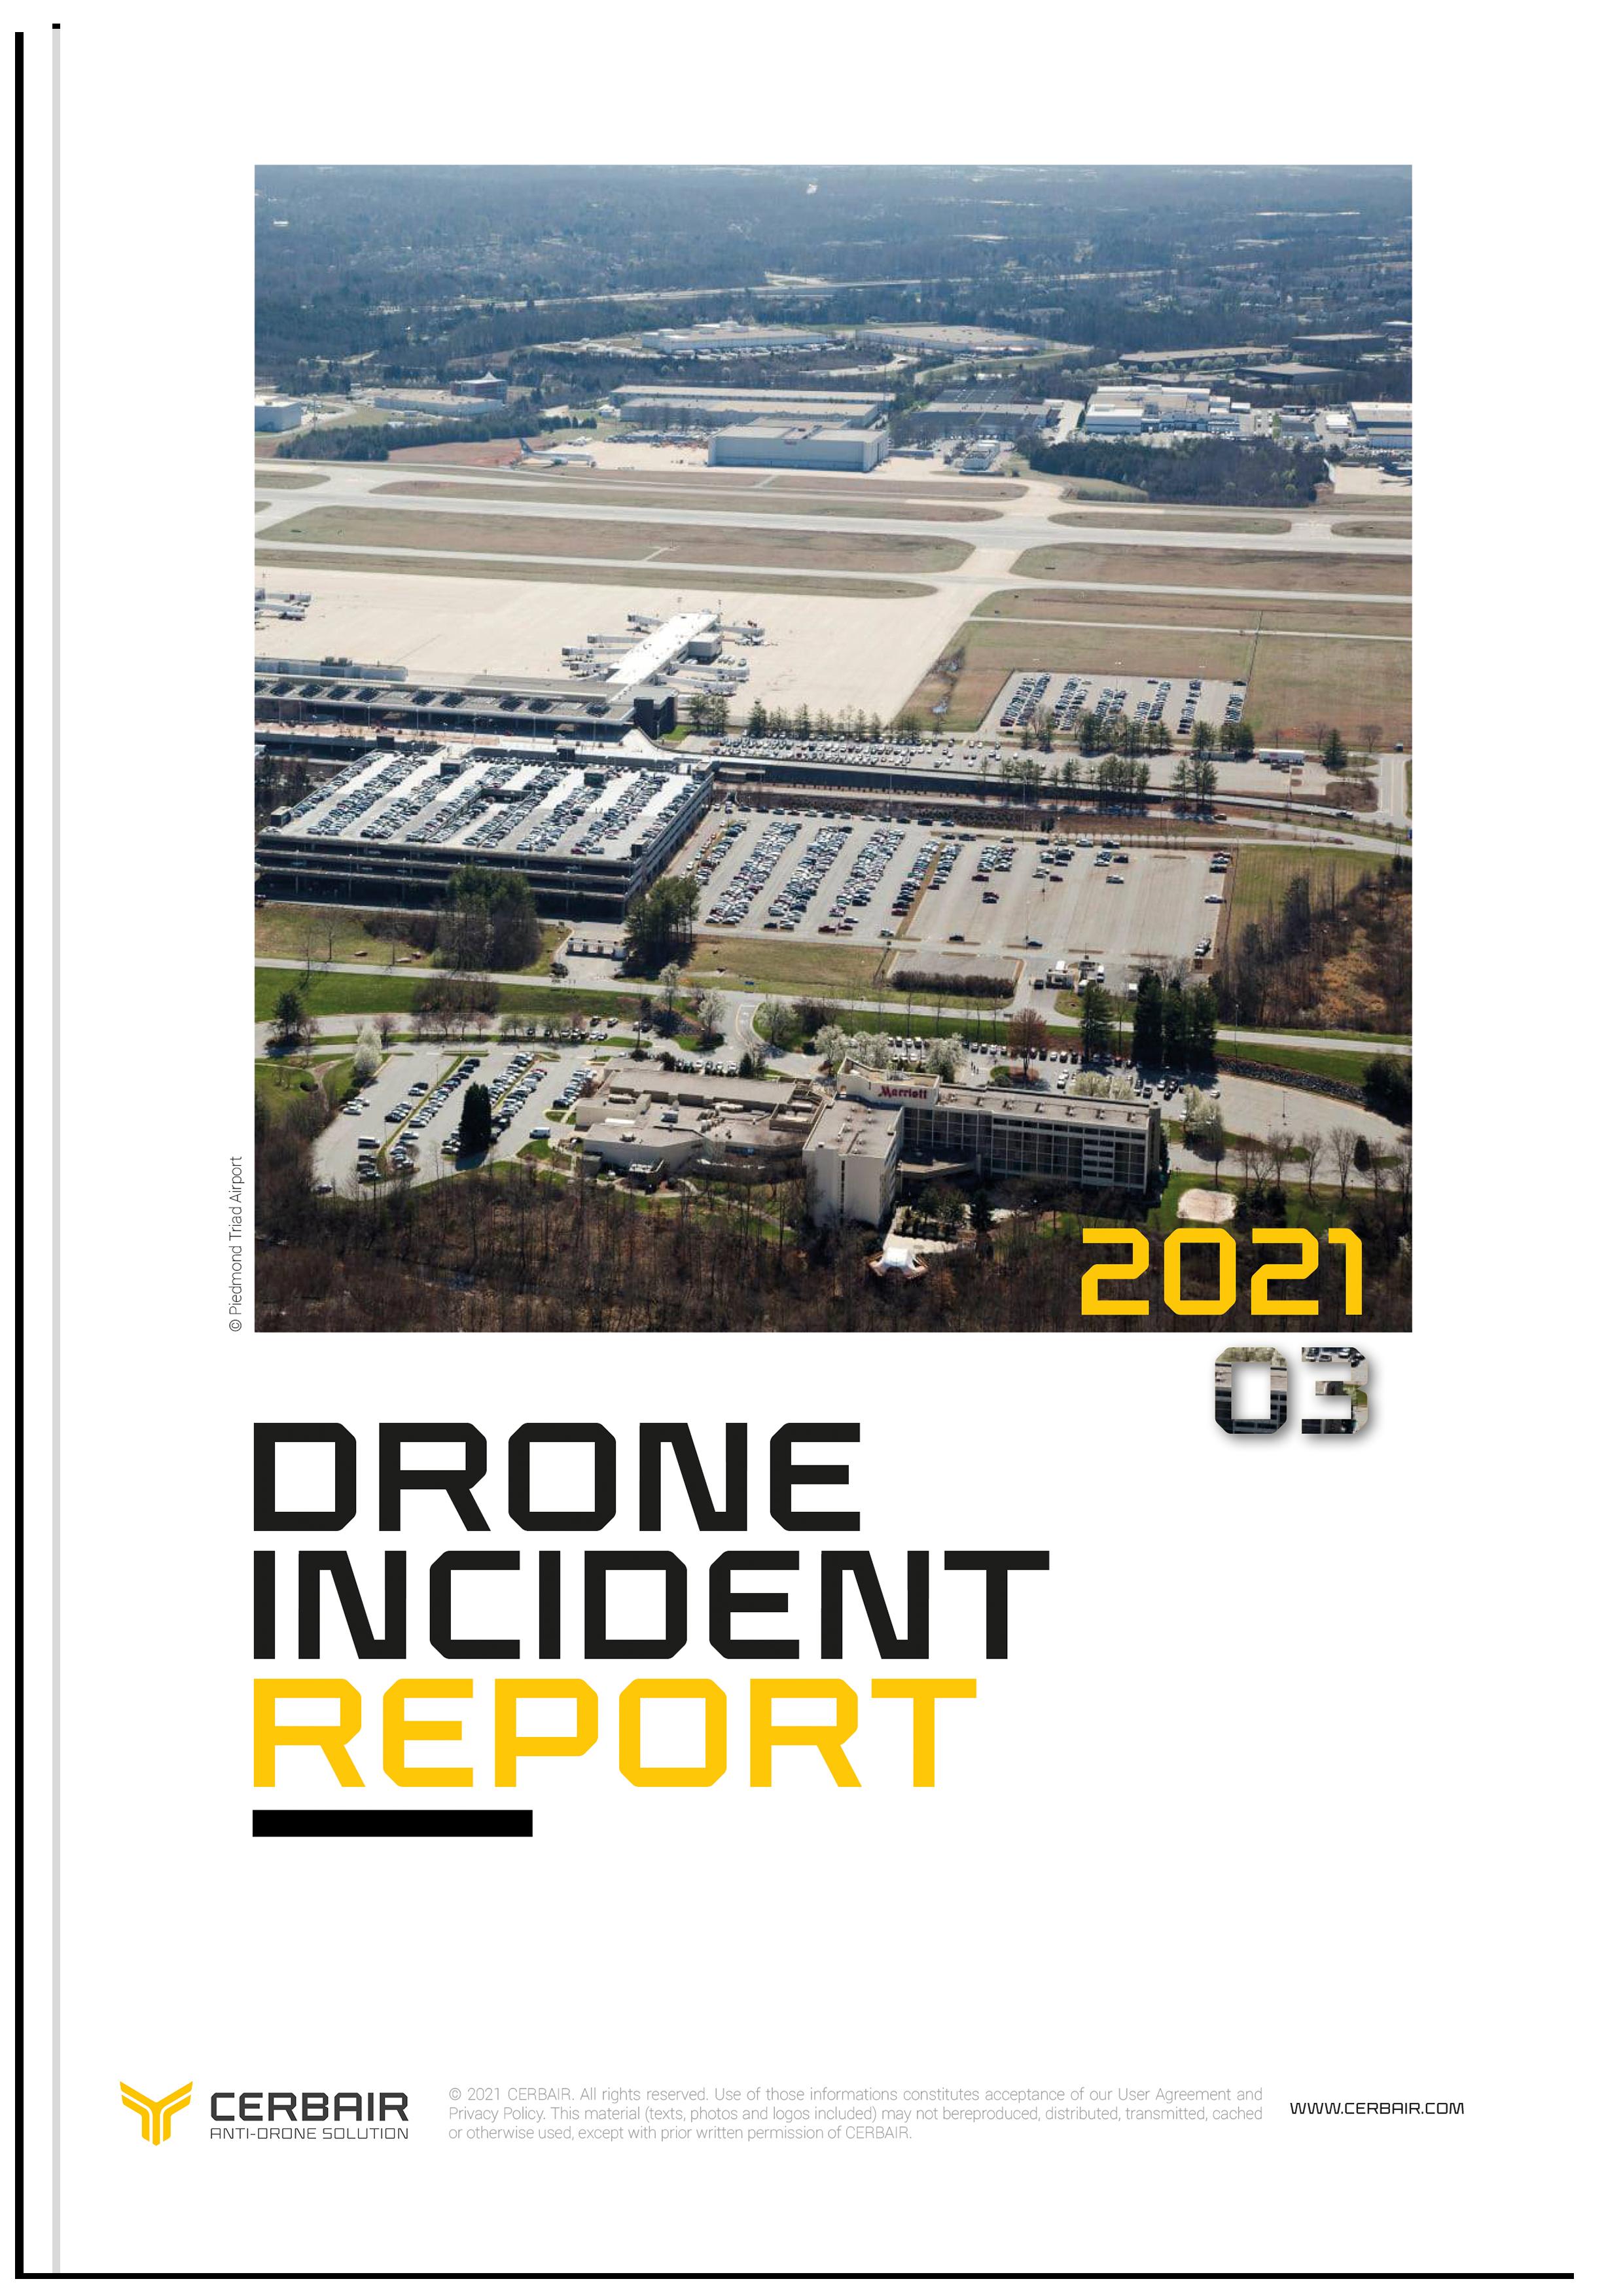 Drone Incident Report – MAR21